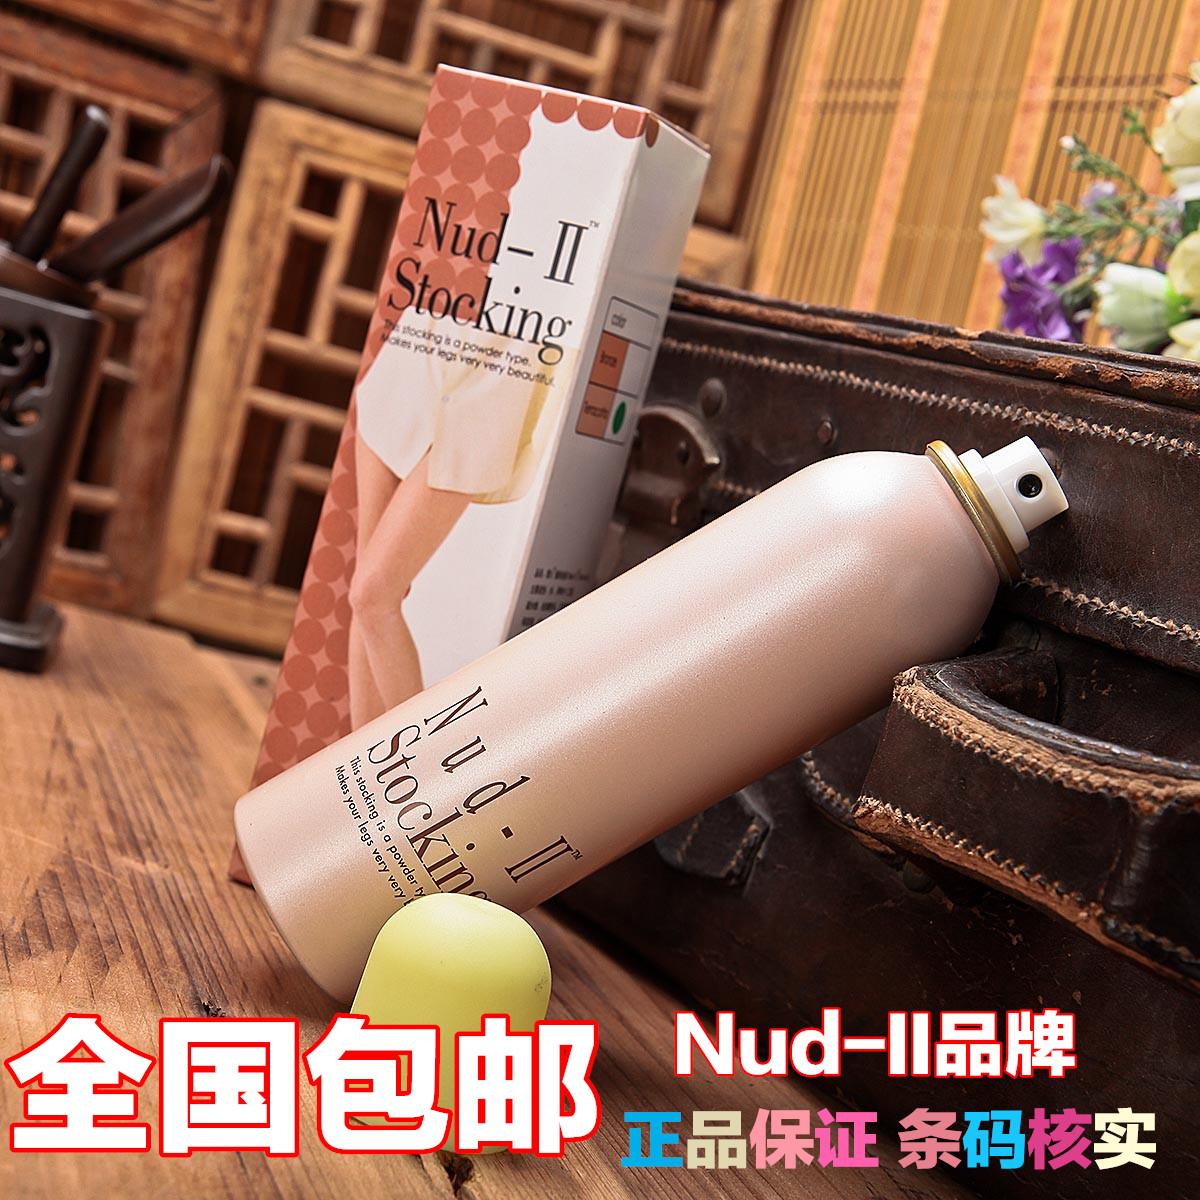 Nud-II隐形丝袜喷雾空气丝袜喷雾美白隐形液美腿遮瑕防晒BB霜防水